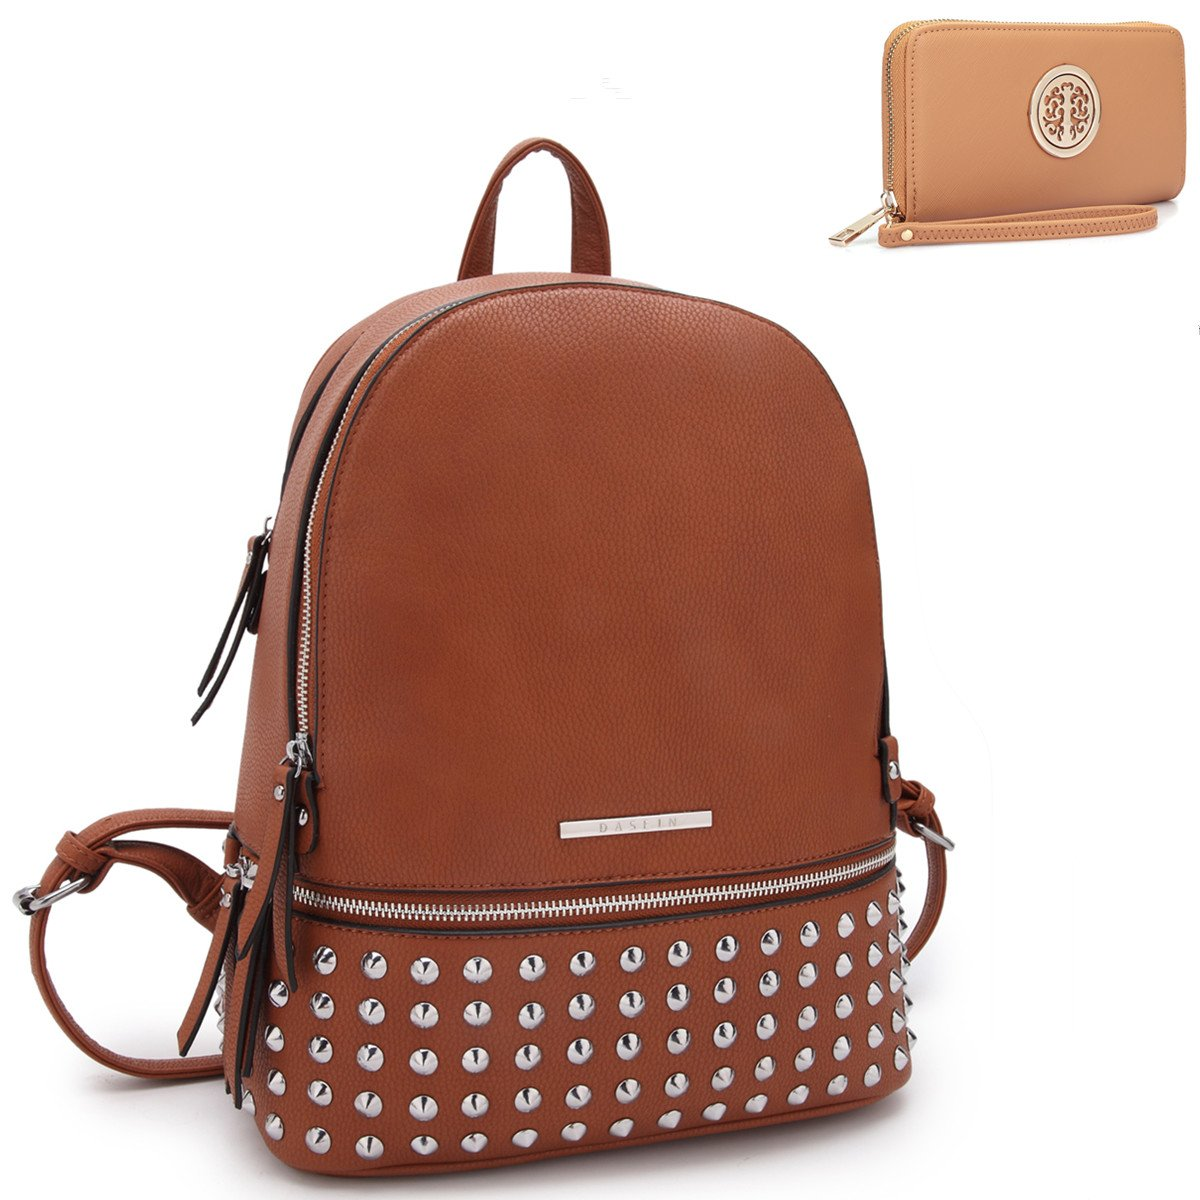 MMK collection Women Fashion Backpack with wallet (2443)~Designer Purse for Women ~Multi Pocket Backpack~ Beautiful Designer Handbag Set(2443/7025) (MA-XL-21-7580-BR 168 BR)